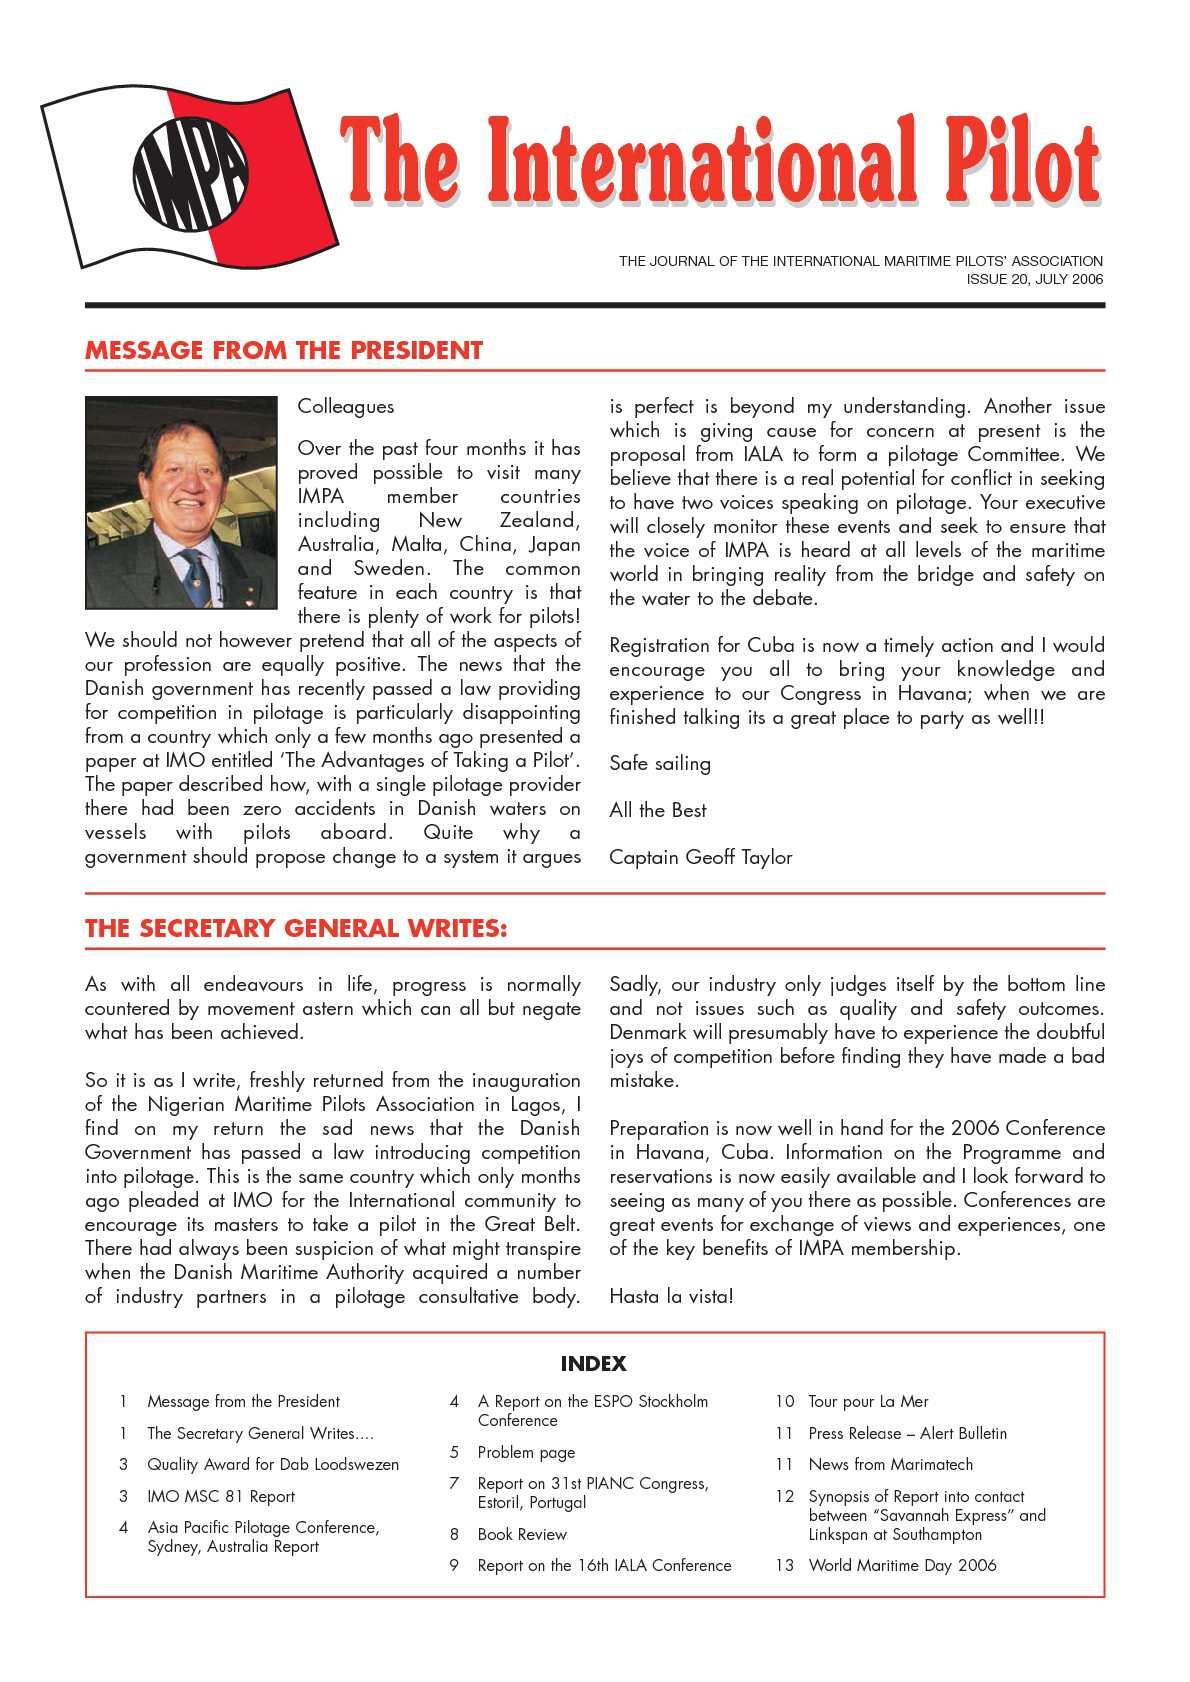 Calaméo - International Pilot - Issue 20